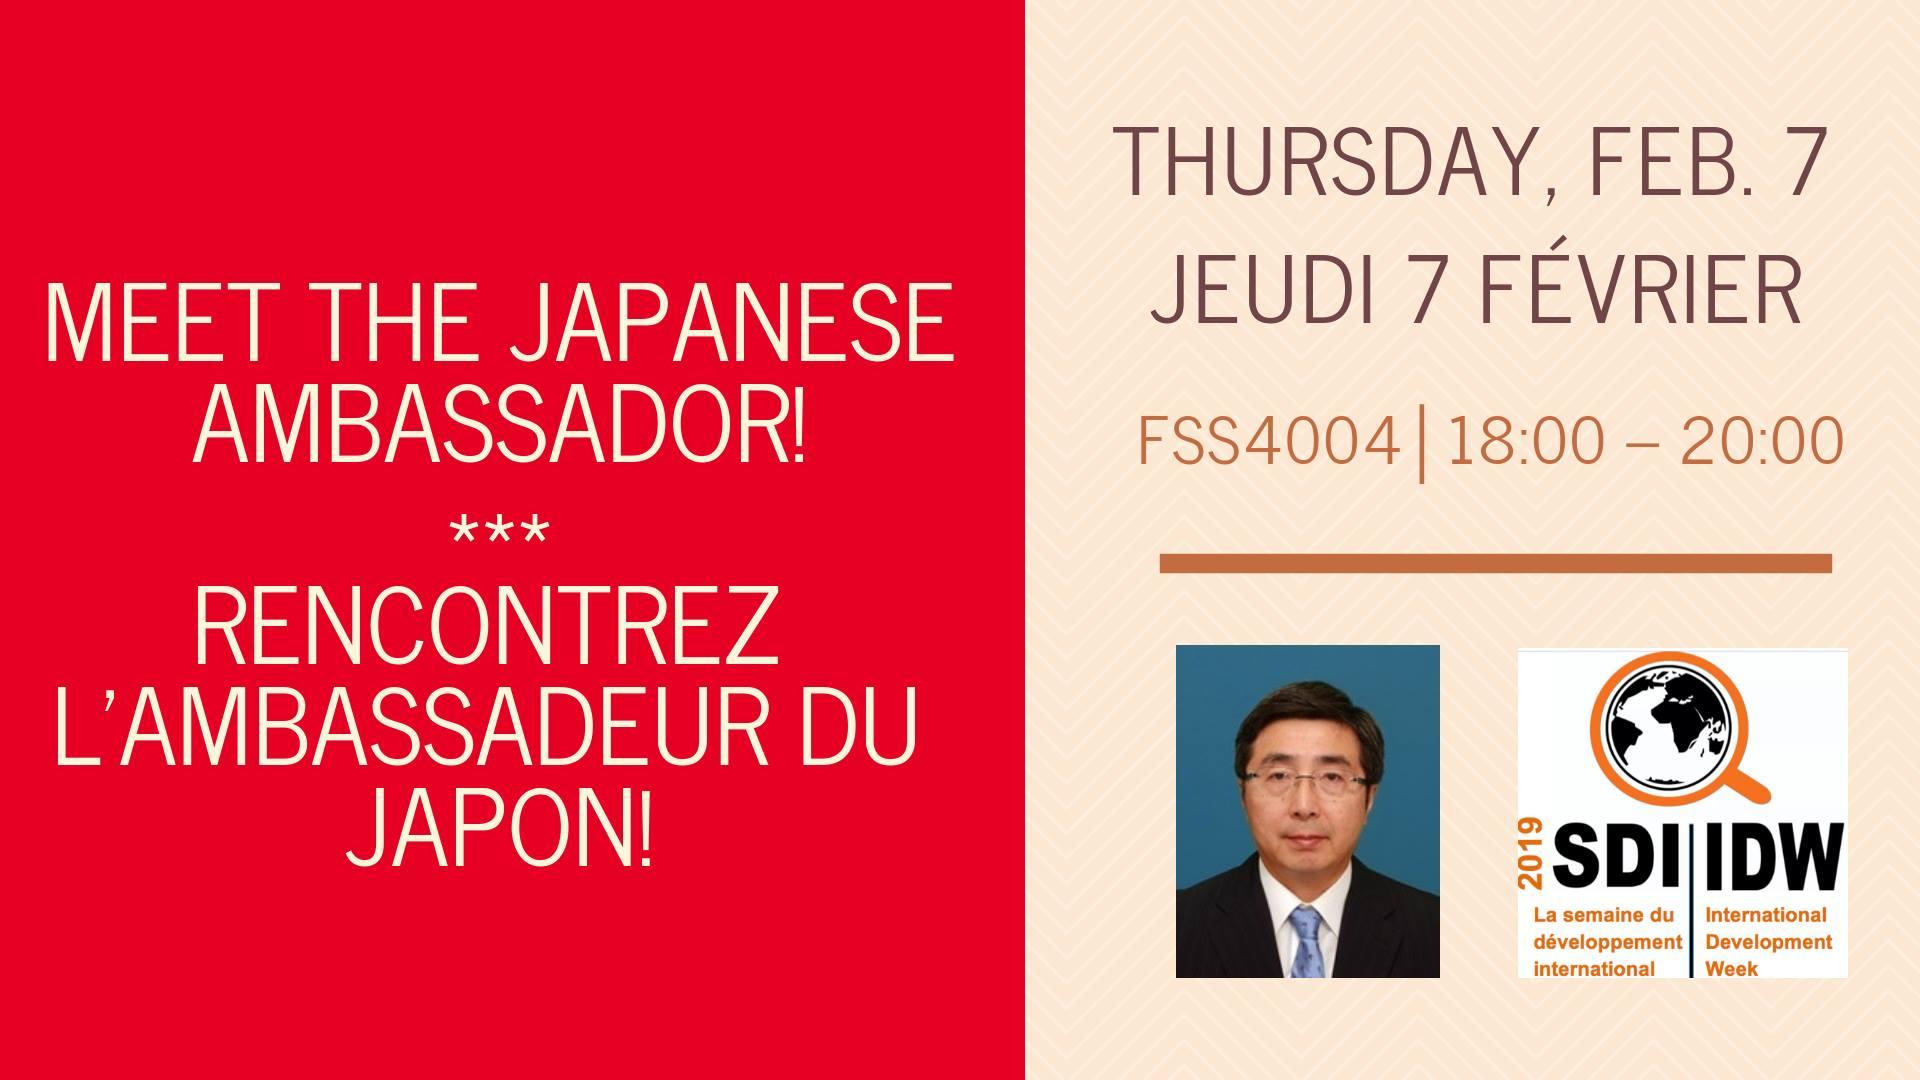 Meet the Japanese Ambassador - CVUO - uottawa events.jpg